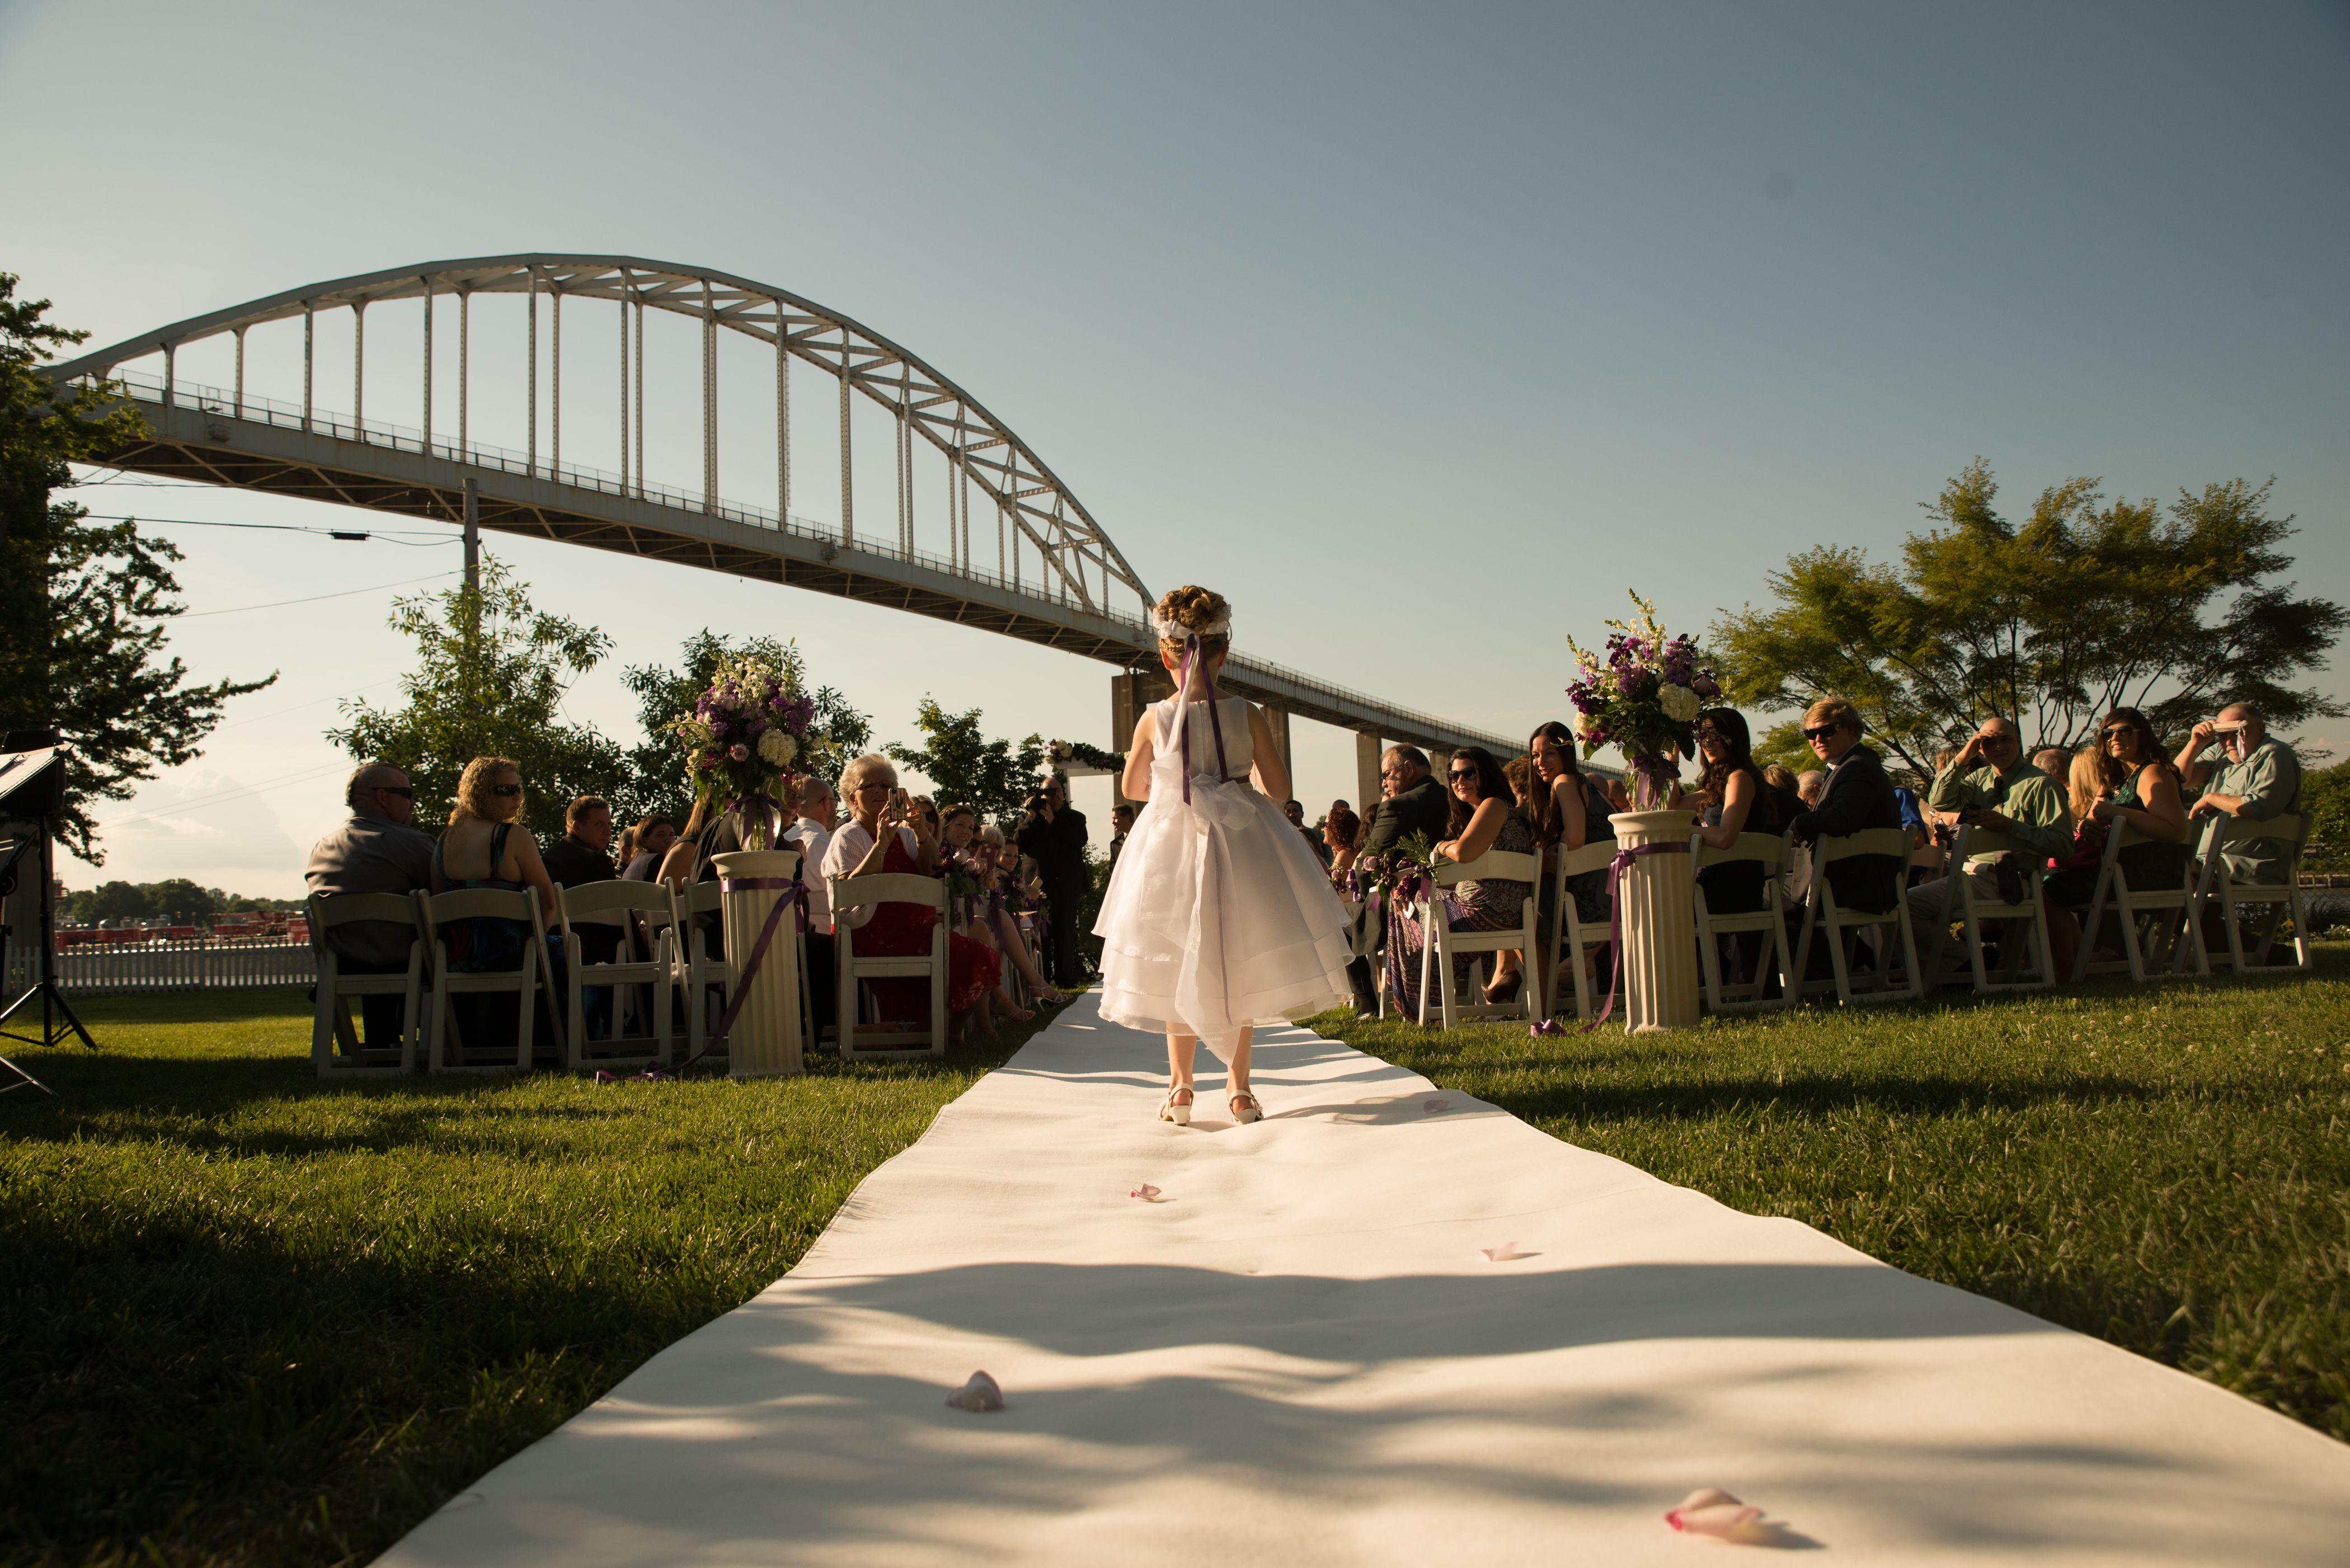 outdoor ceremony in Chesapeake City MD Chesapeake city